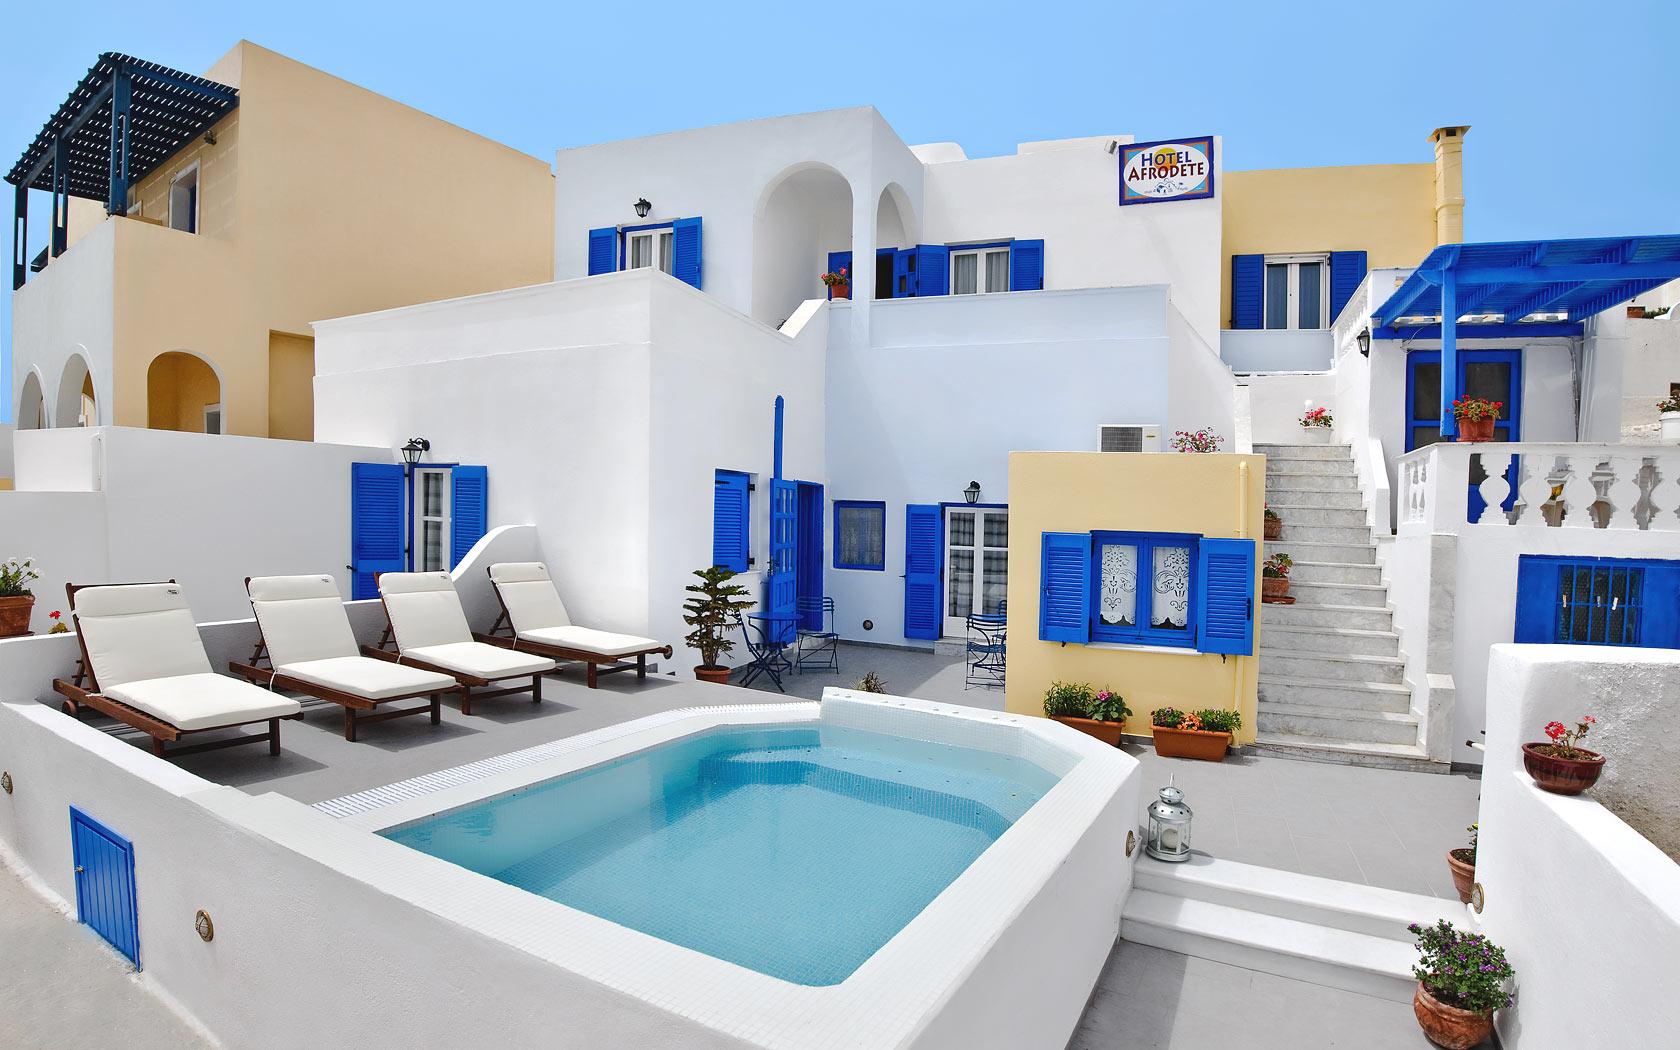 Santorini Hotel Afrodete Fira Hotels Santorini Rooms 1680x1050